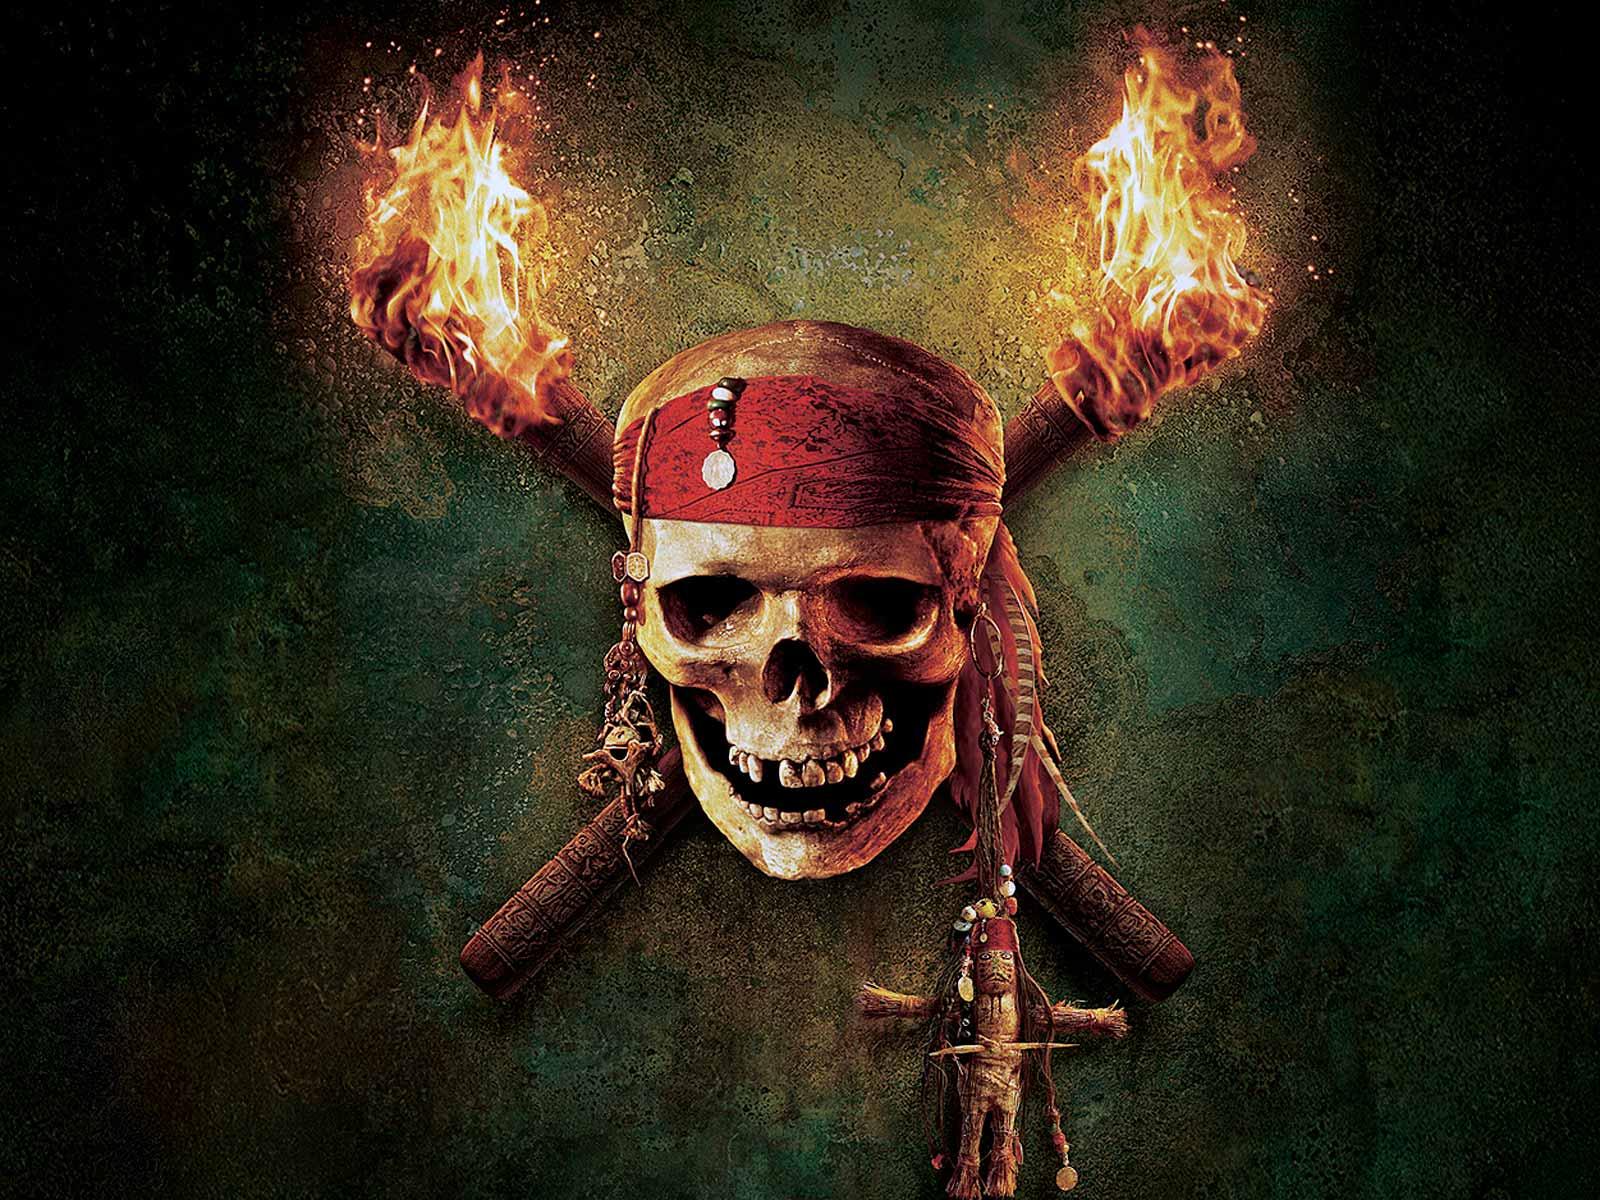 pirate skull wallpapers - wallpaper cave